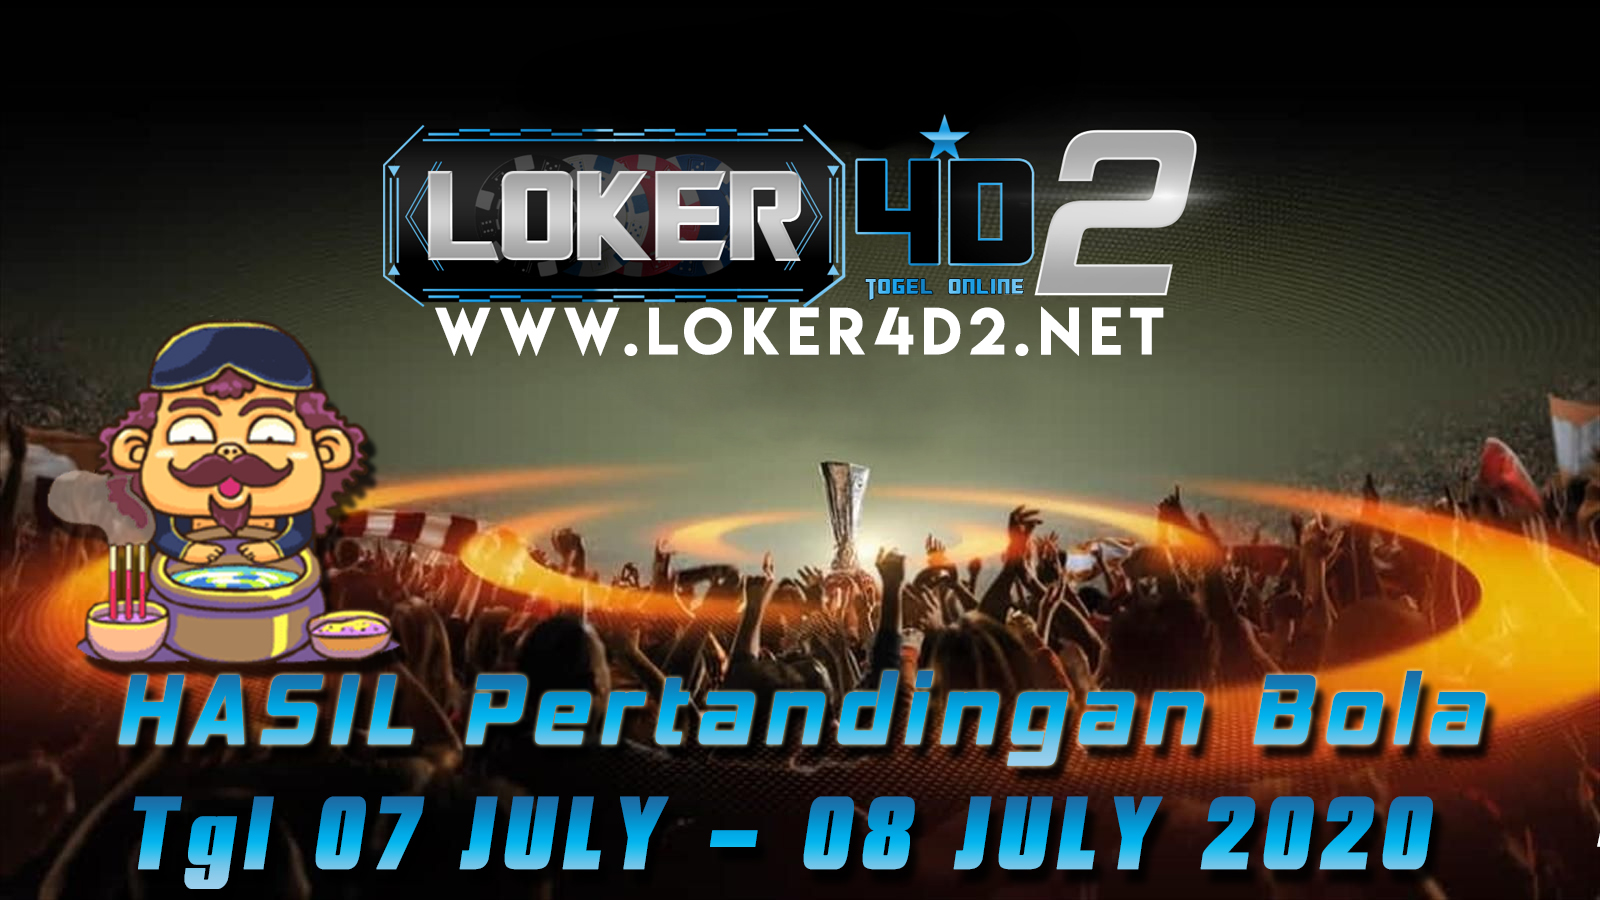 HASIL PERTANDINGAN BOLA 07-08 JULI 2020